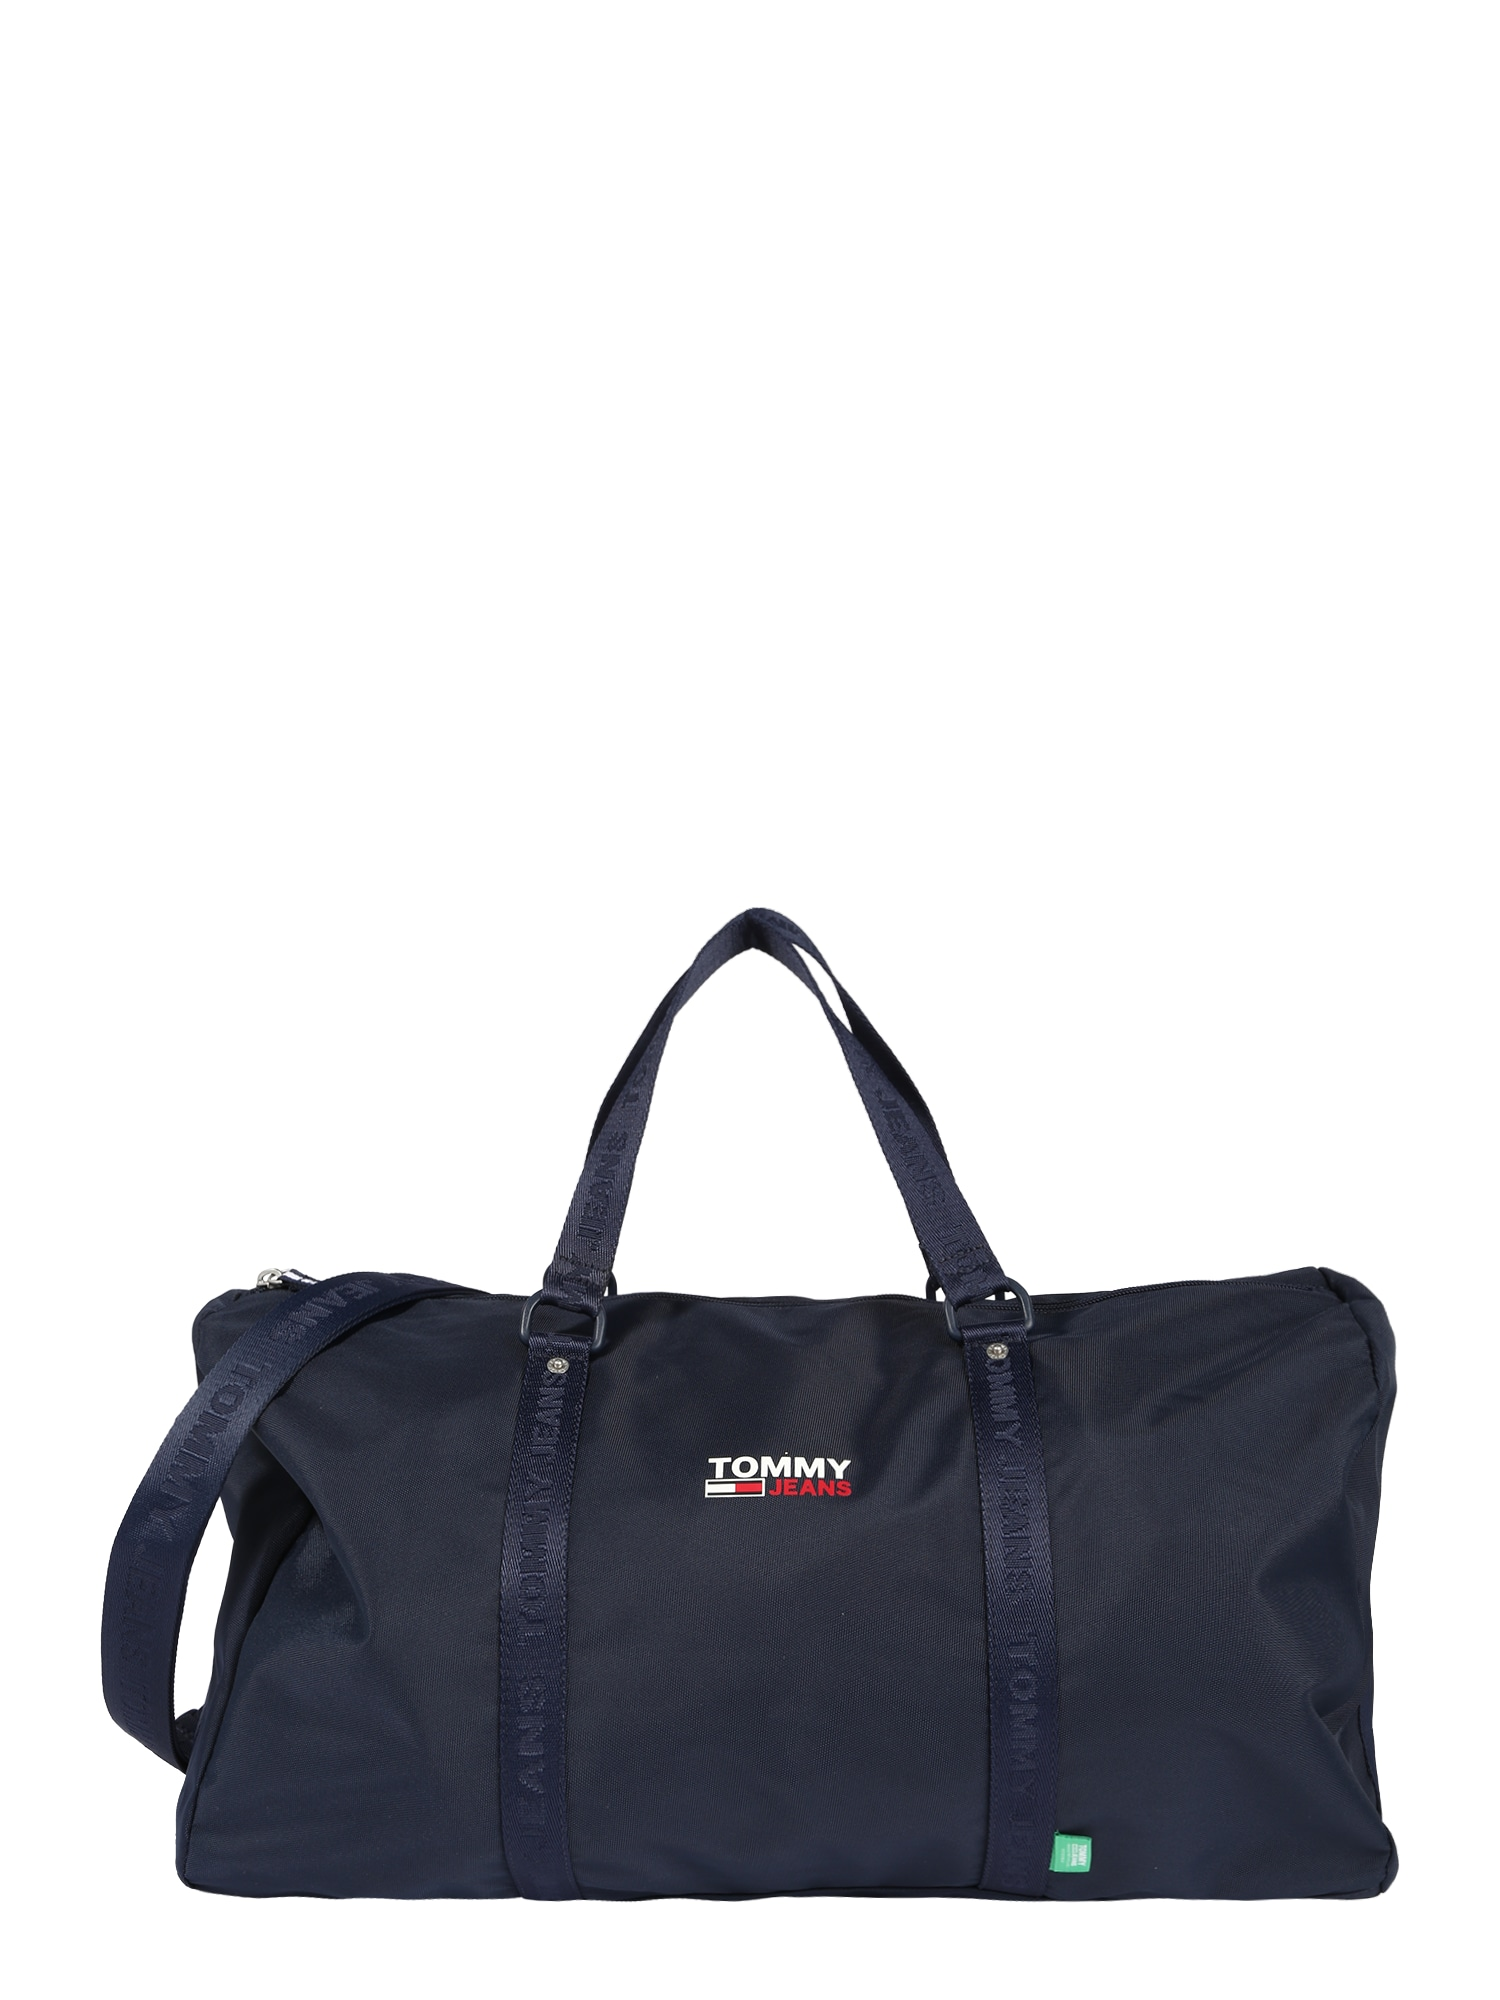 Tommy Jeans Kelioninis krepšys